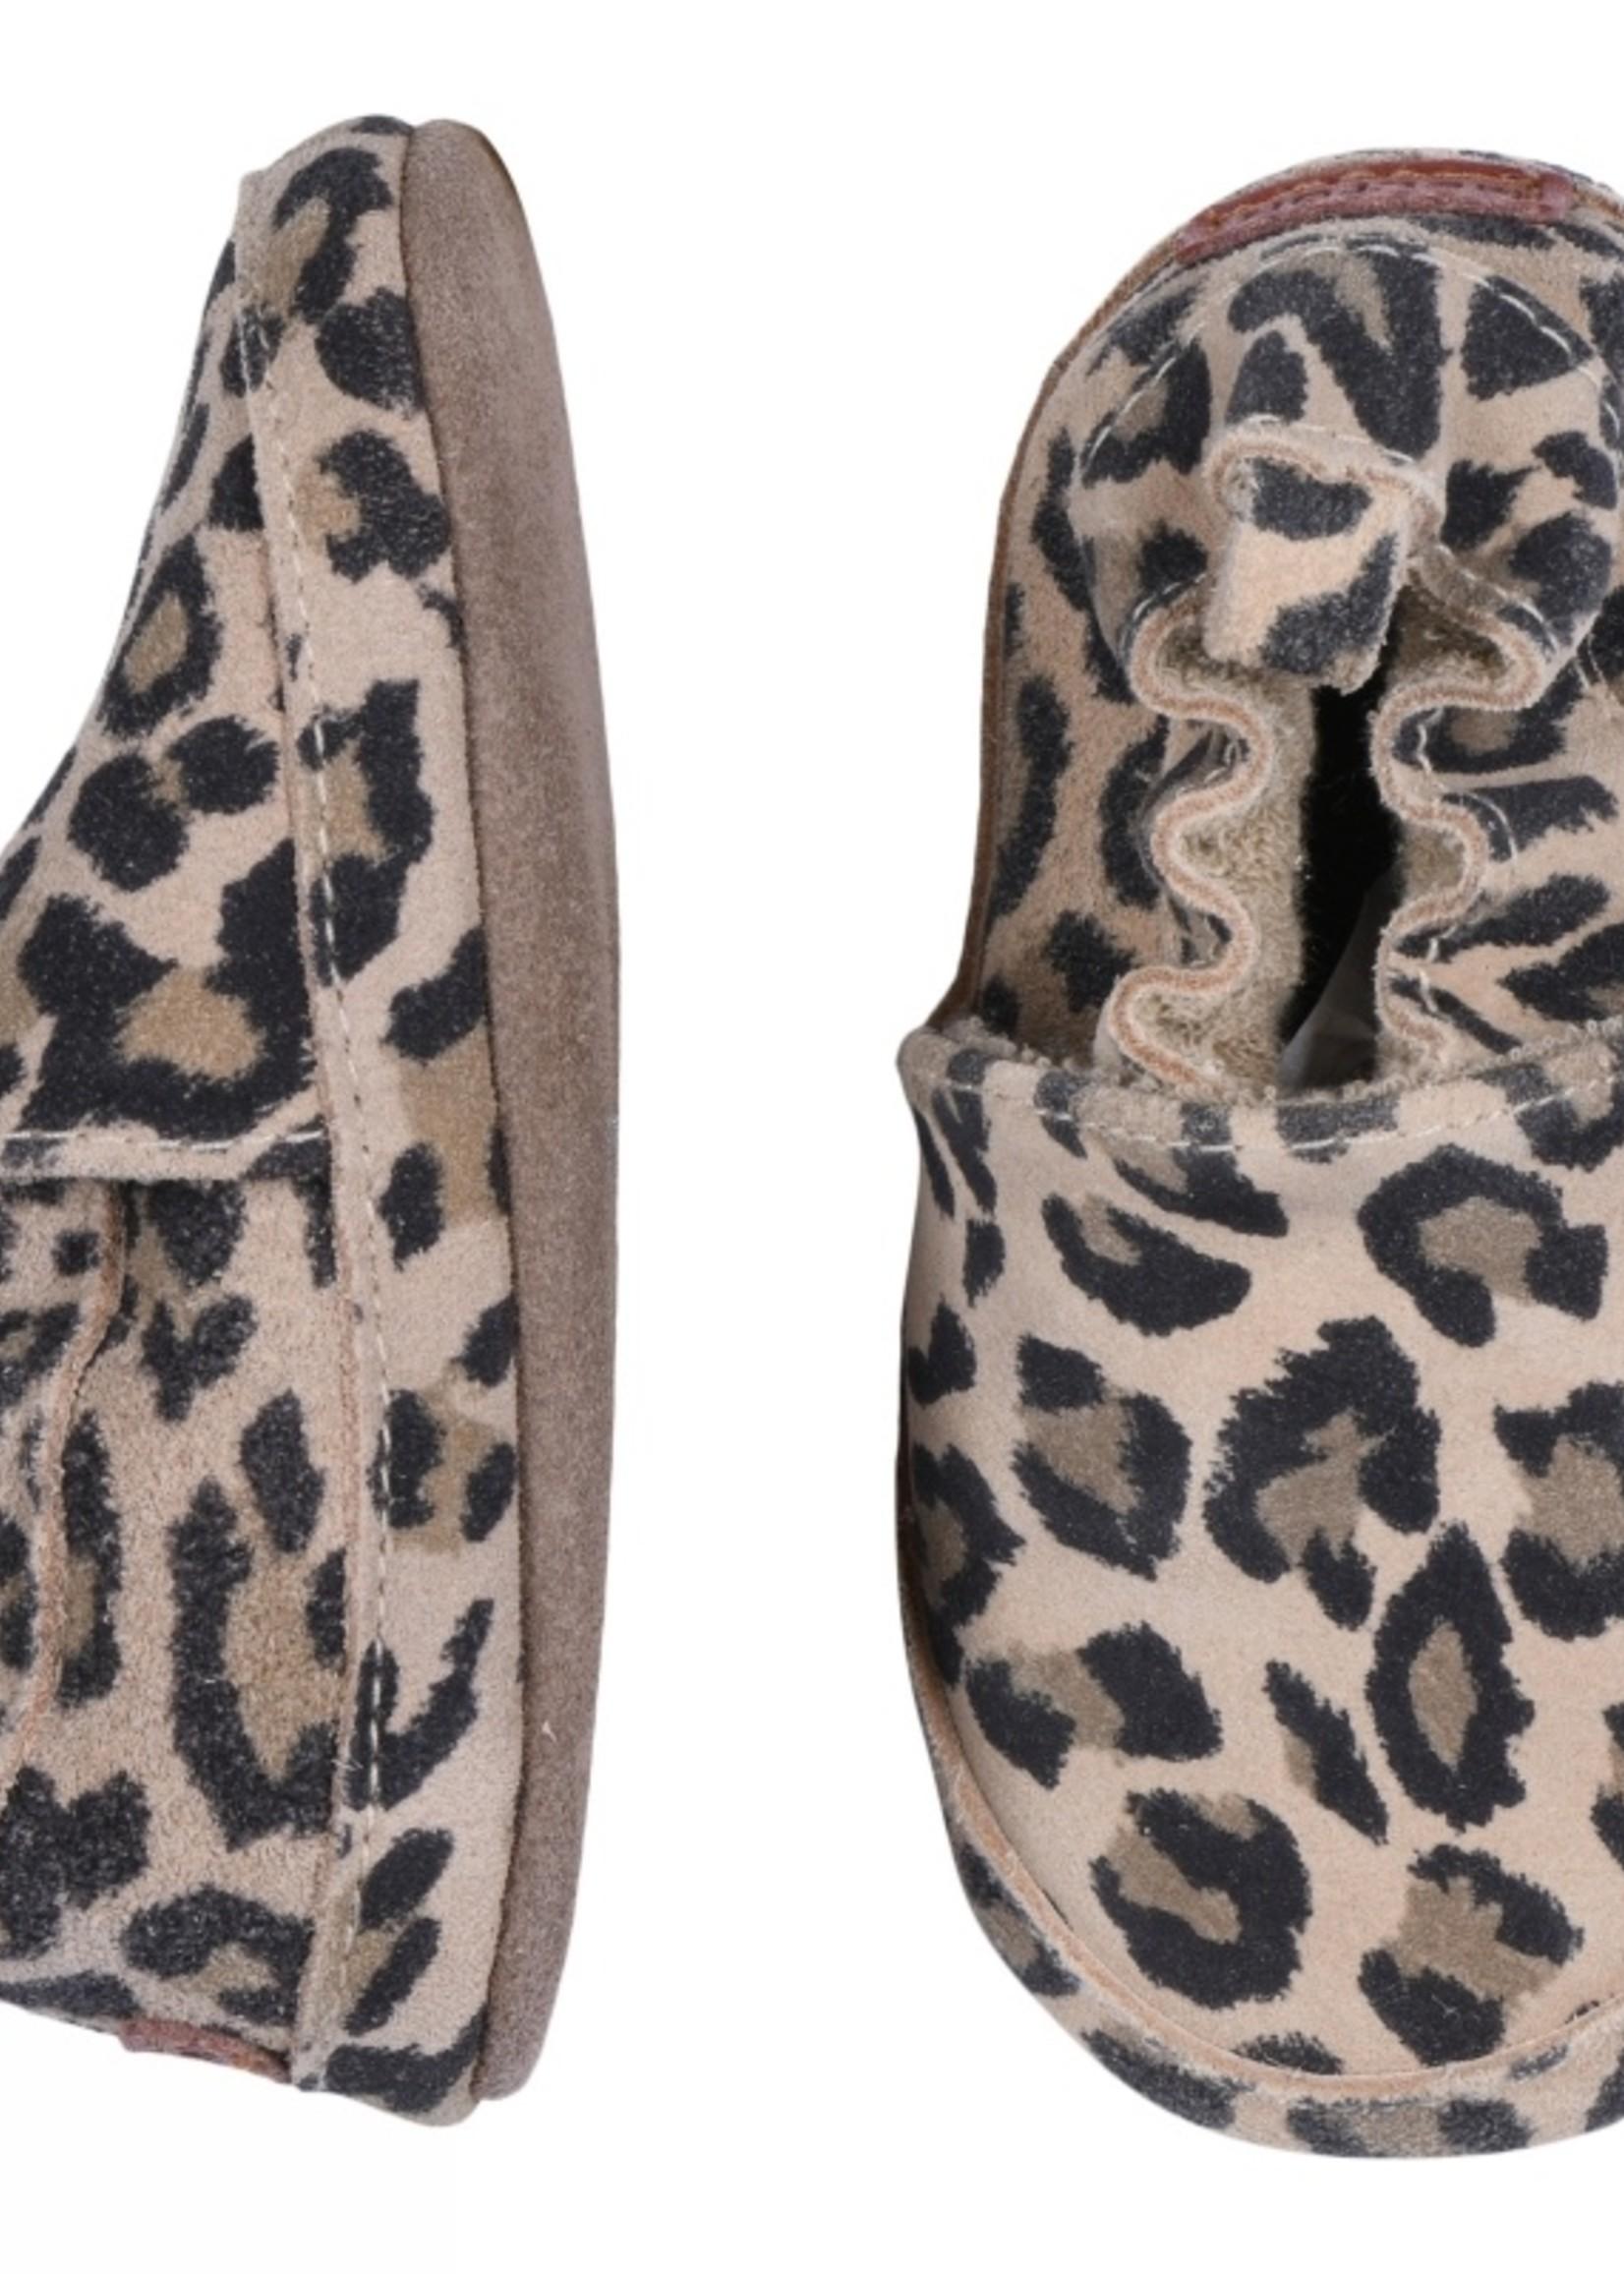 Leather Shoe - Animal Skin